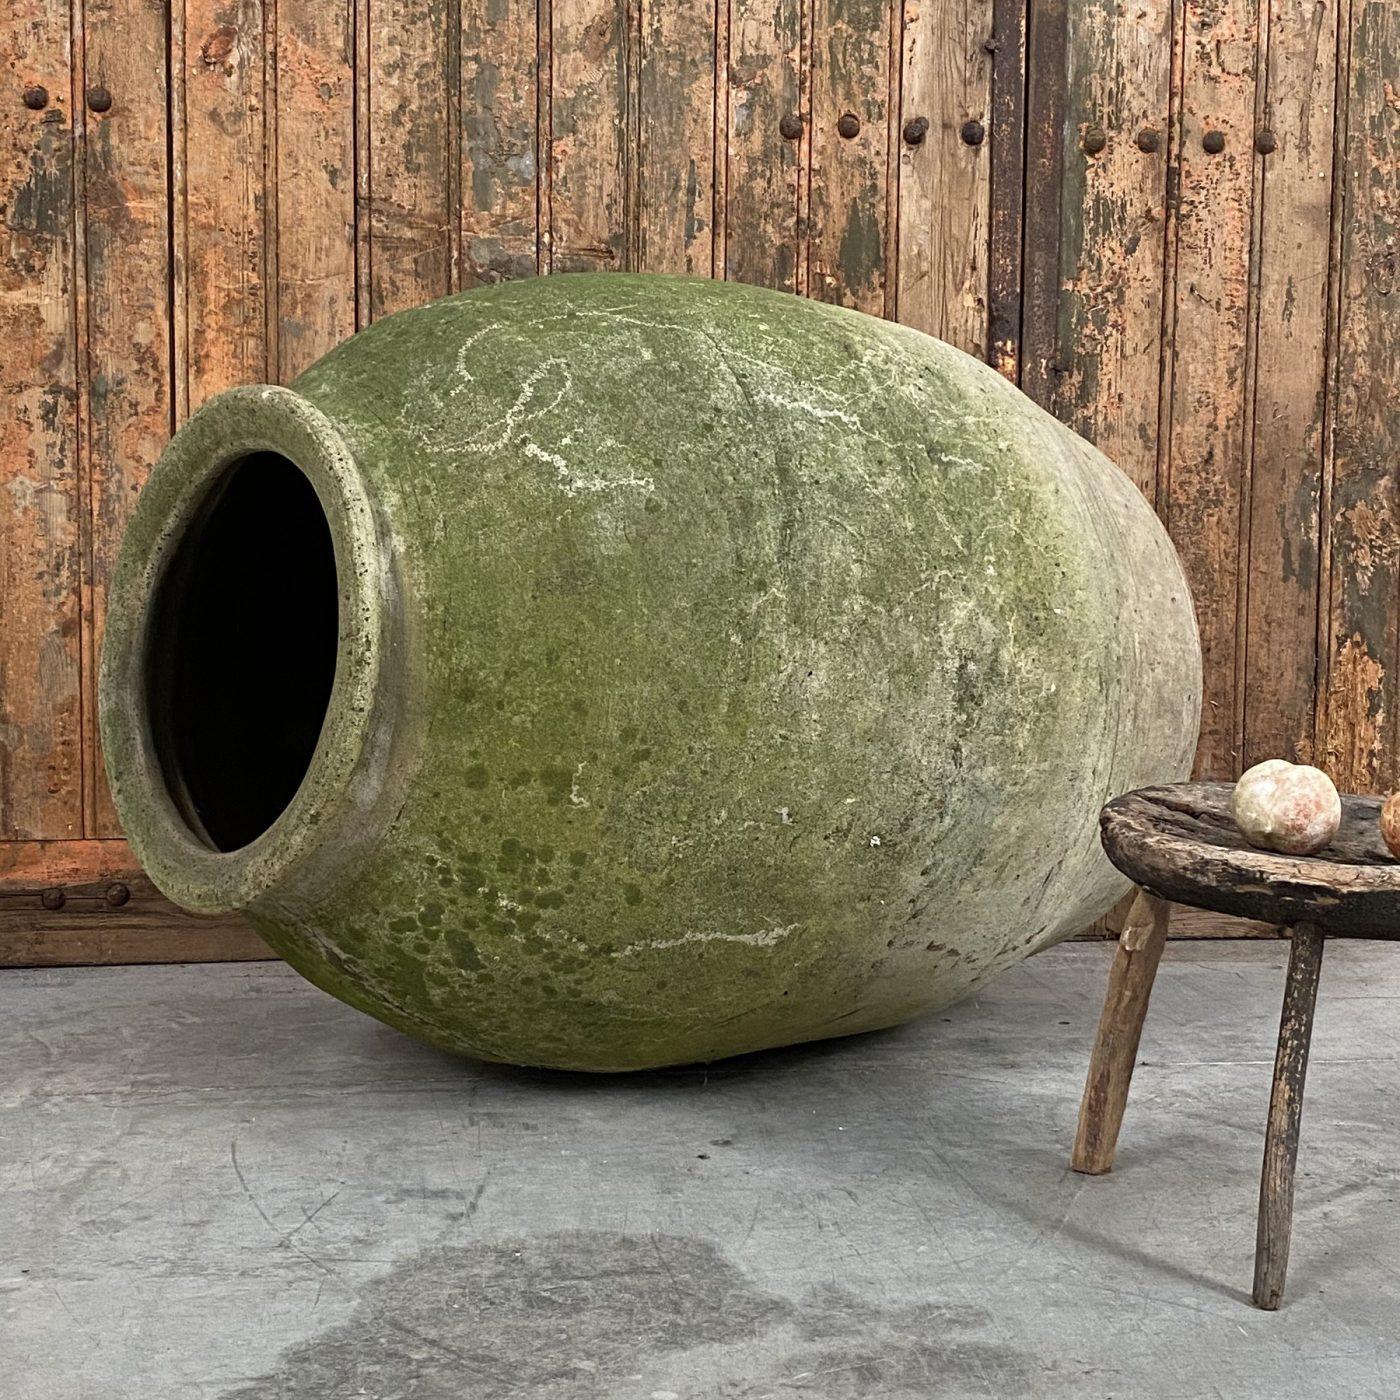 objet-vagabond-terracotta-jar0005